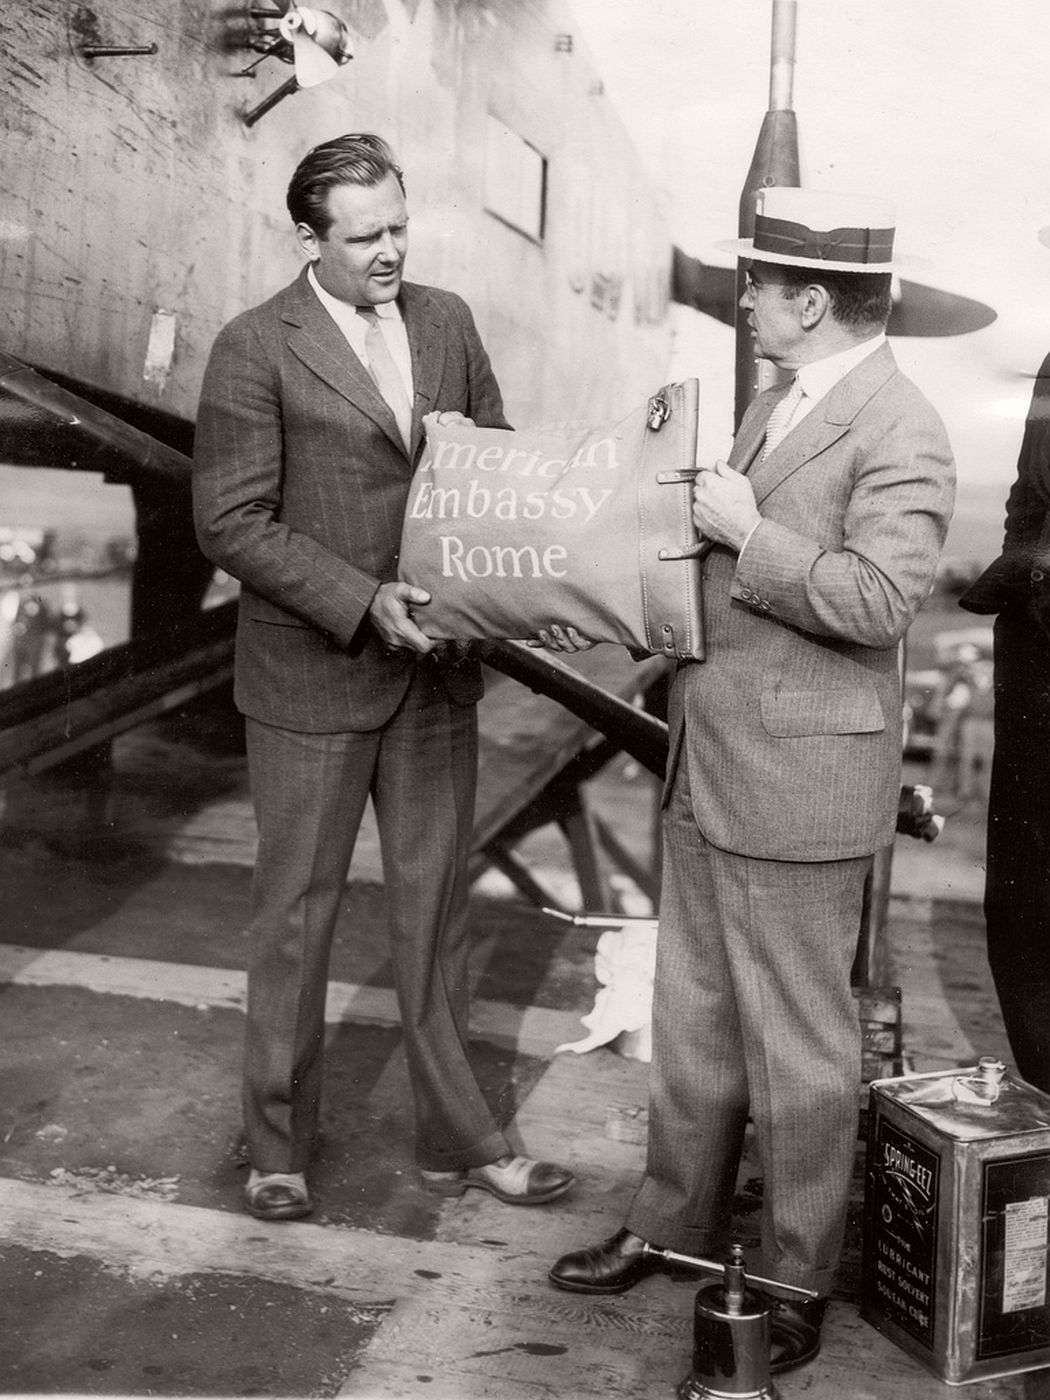 Airmail pilot Lloyd Bertaud and an unidentified individual, September 6, 1927